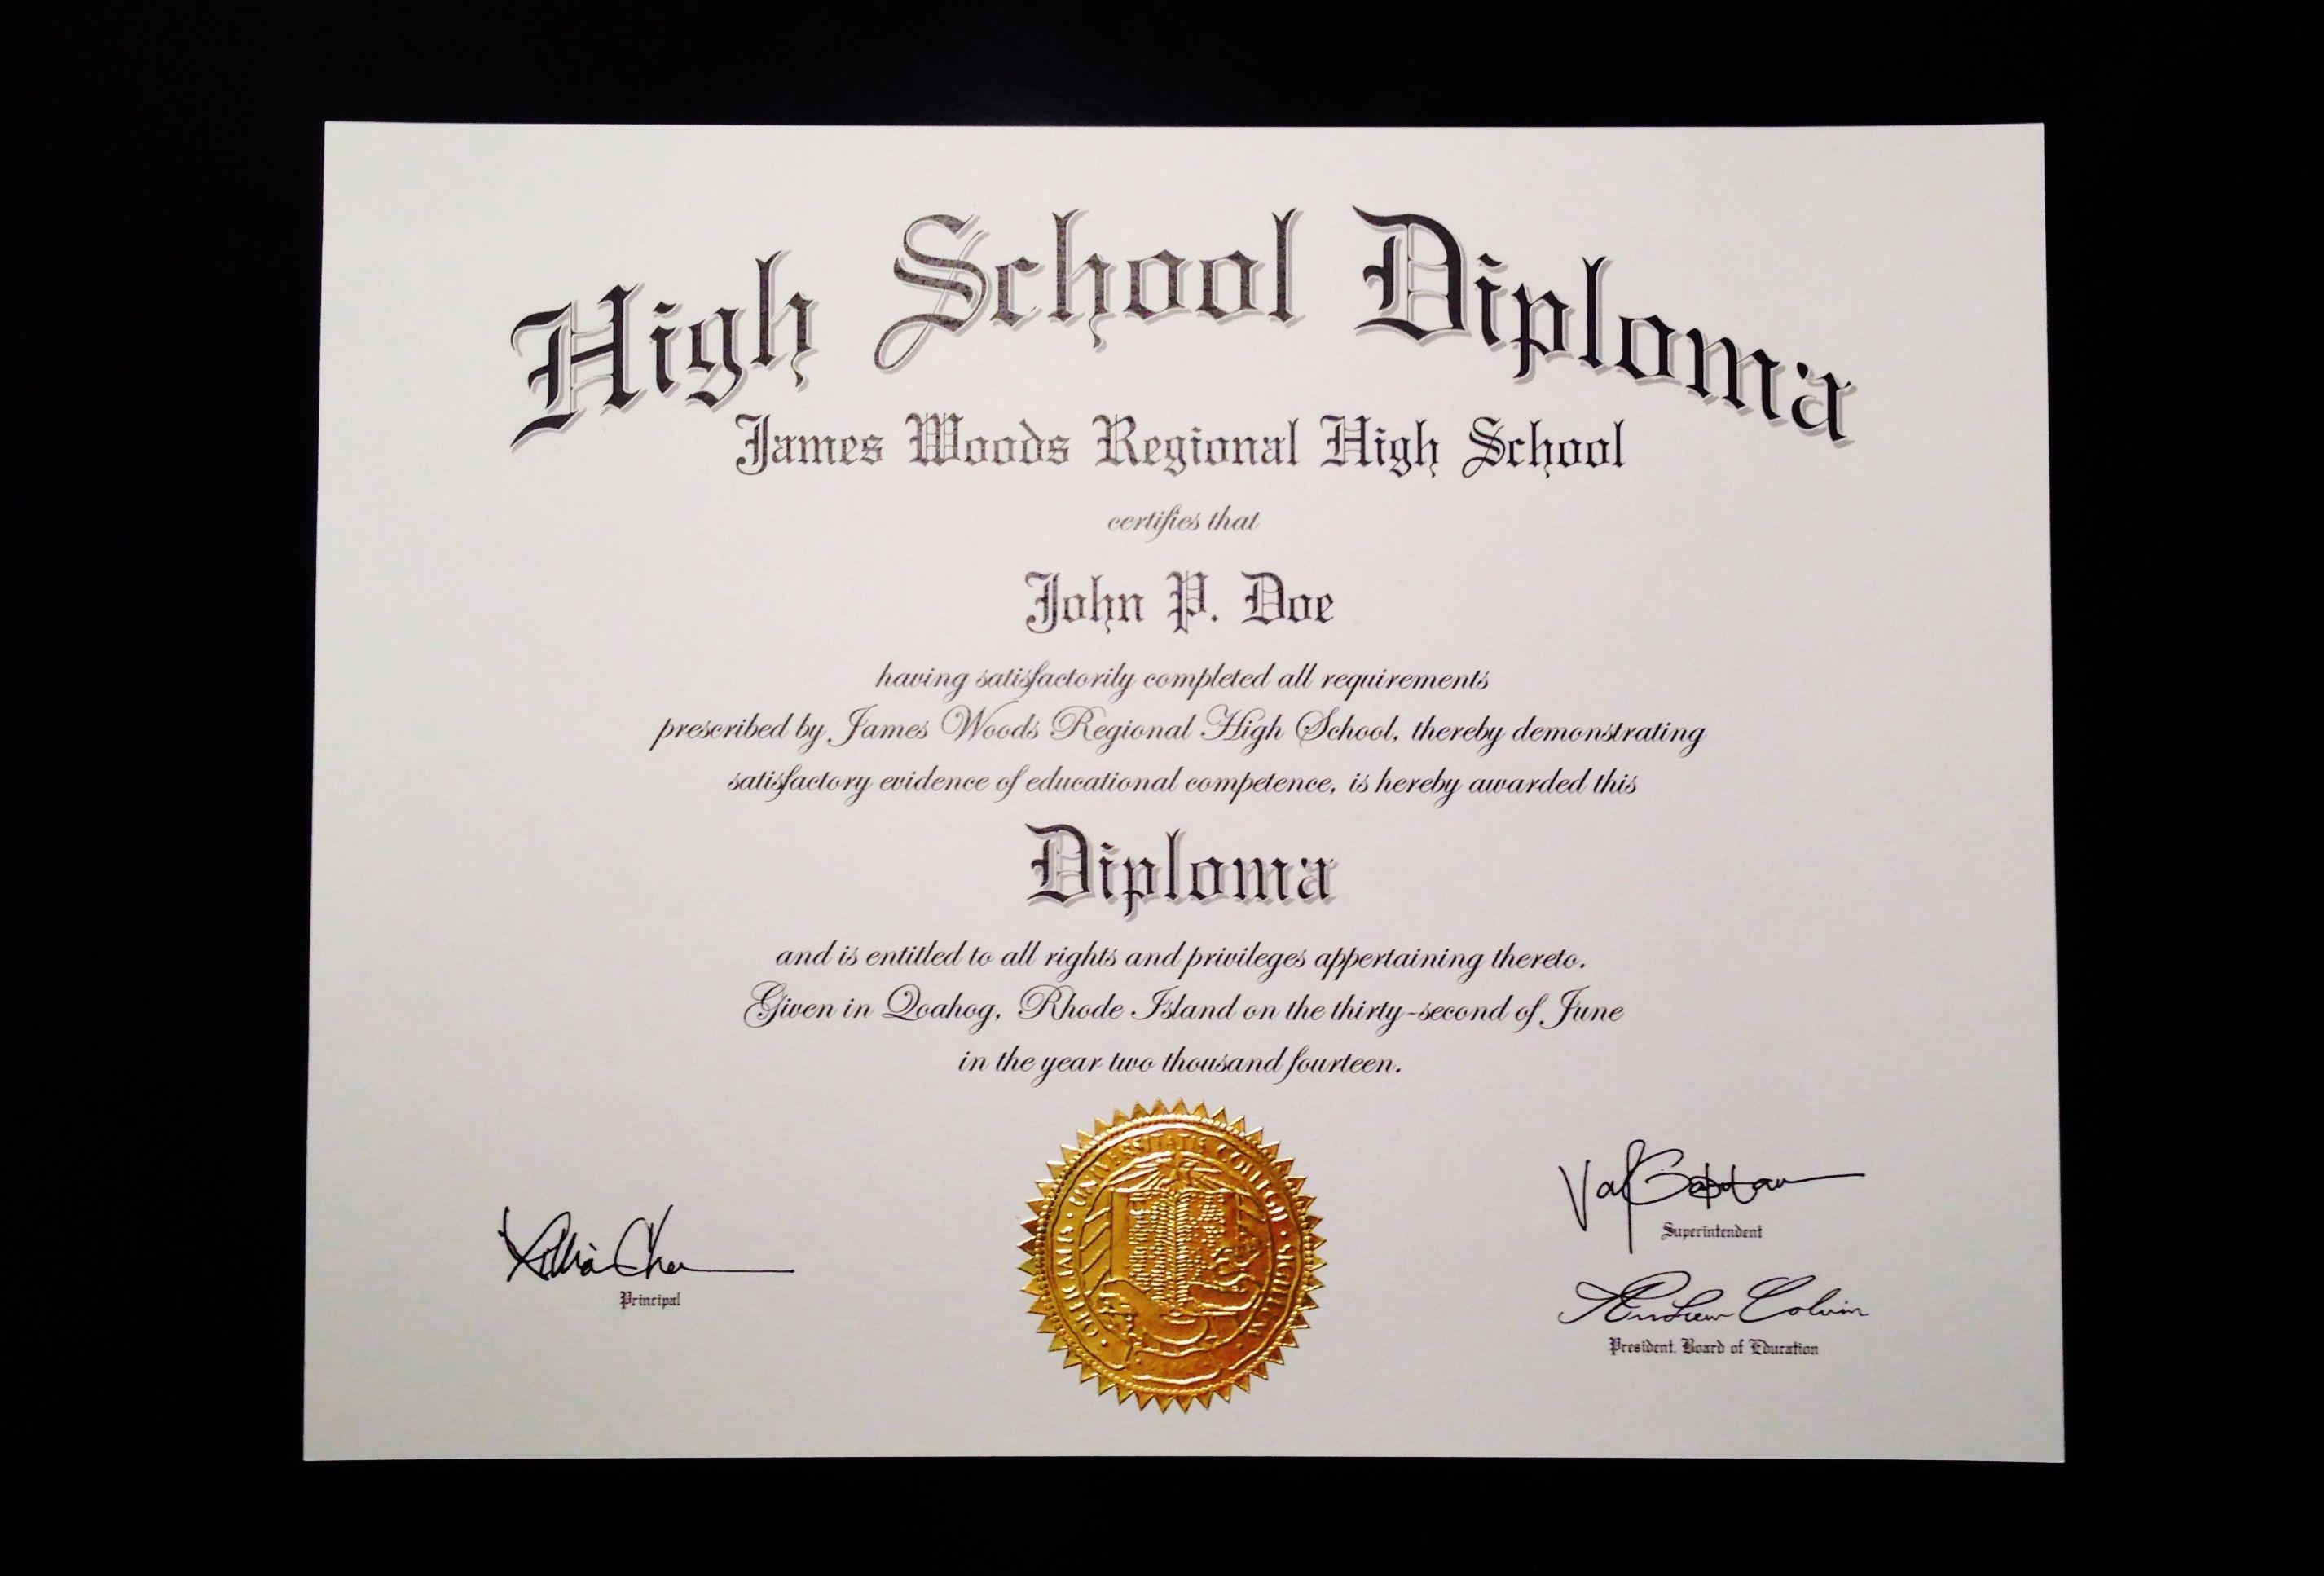 Fake+High+School+Diploma+Template | Jeffrey D Brammer | Fake High - Free Printable High School Diploma Templates